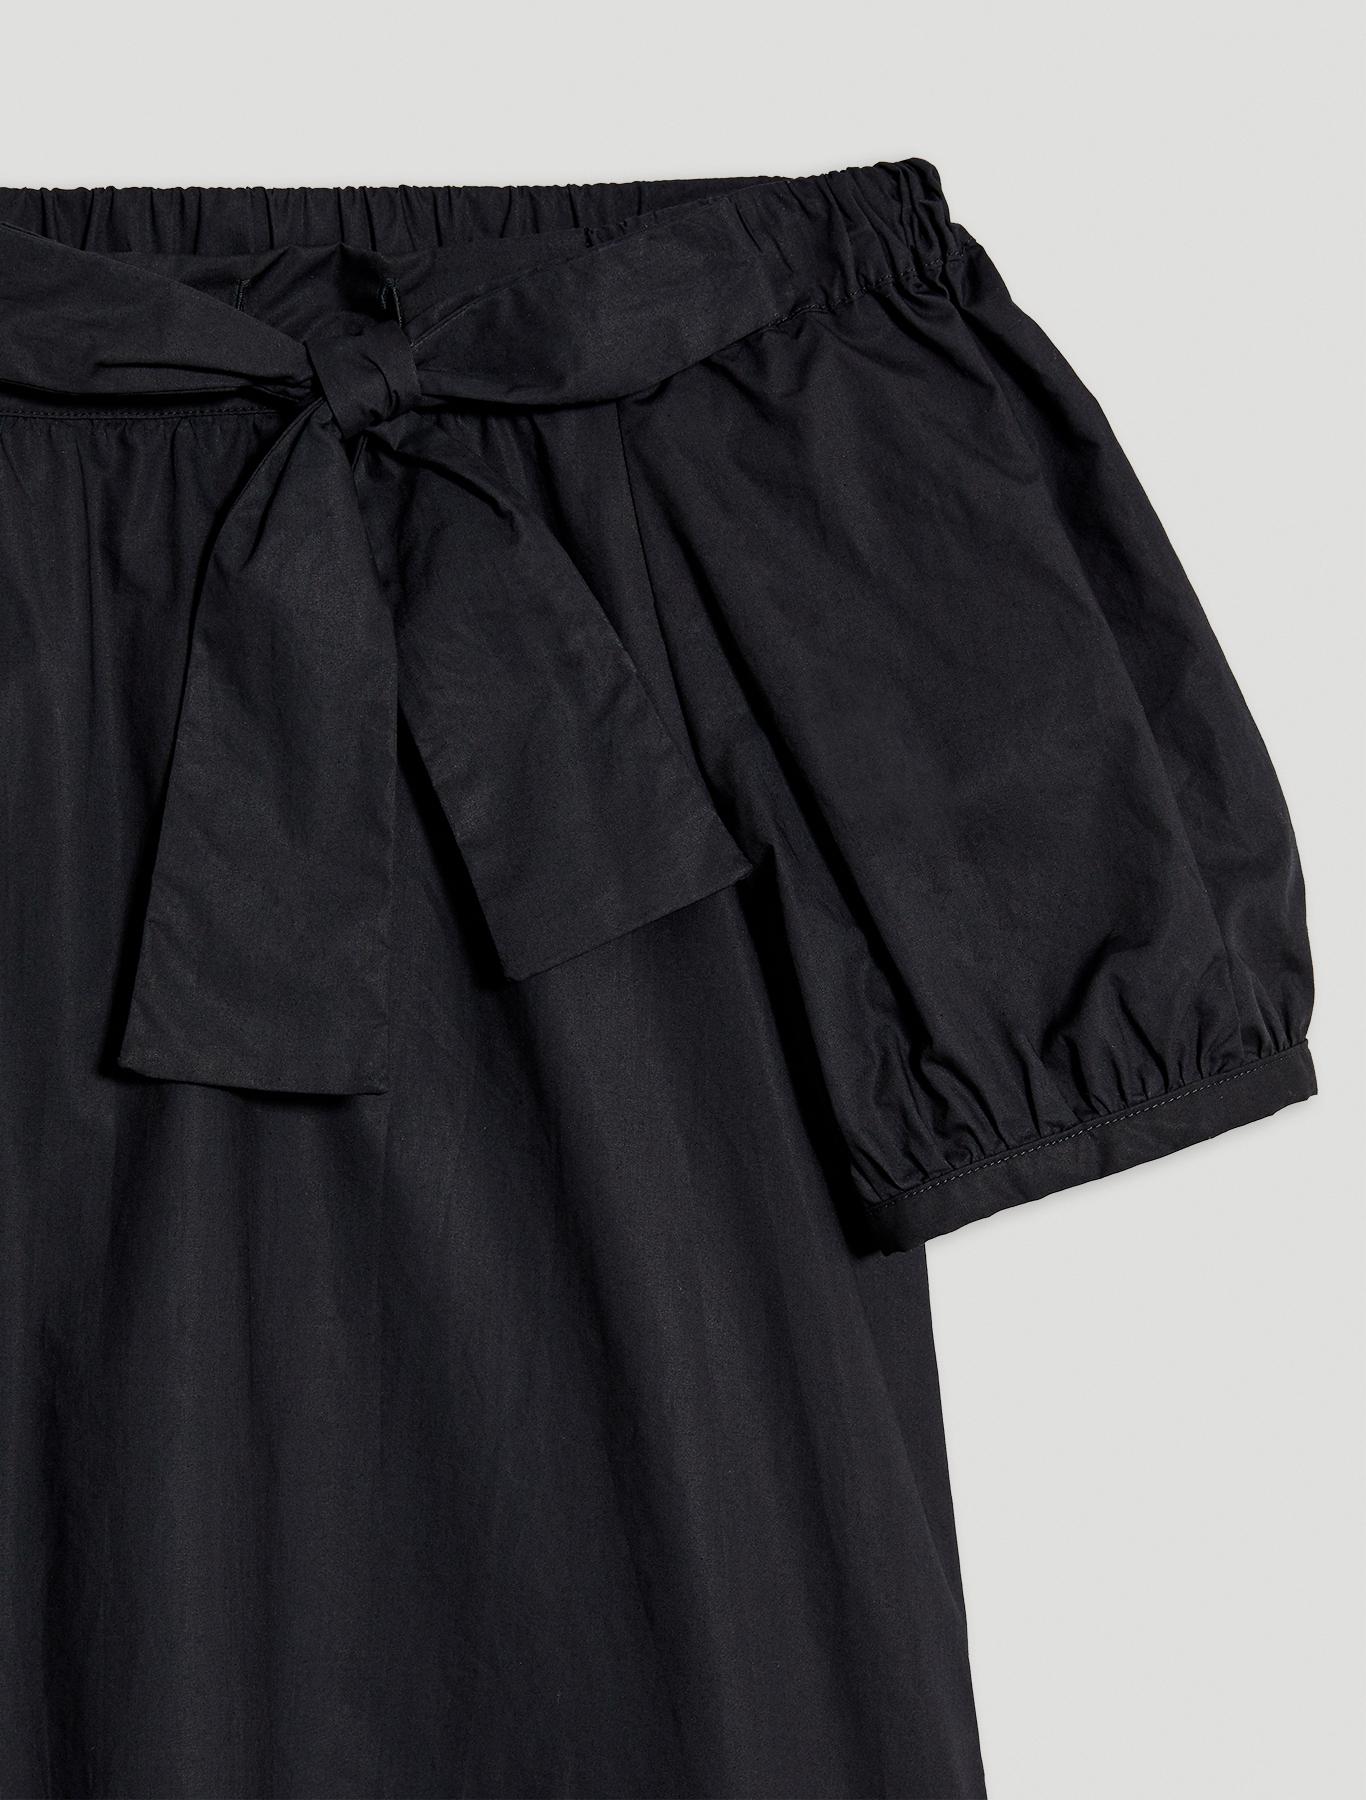 Cotton poplin dress - black - pennyblack